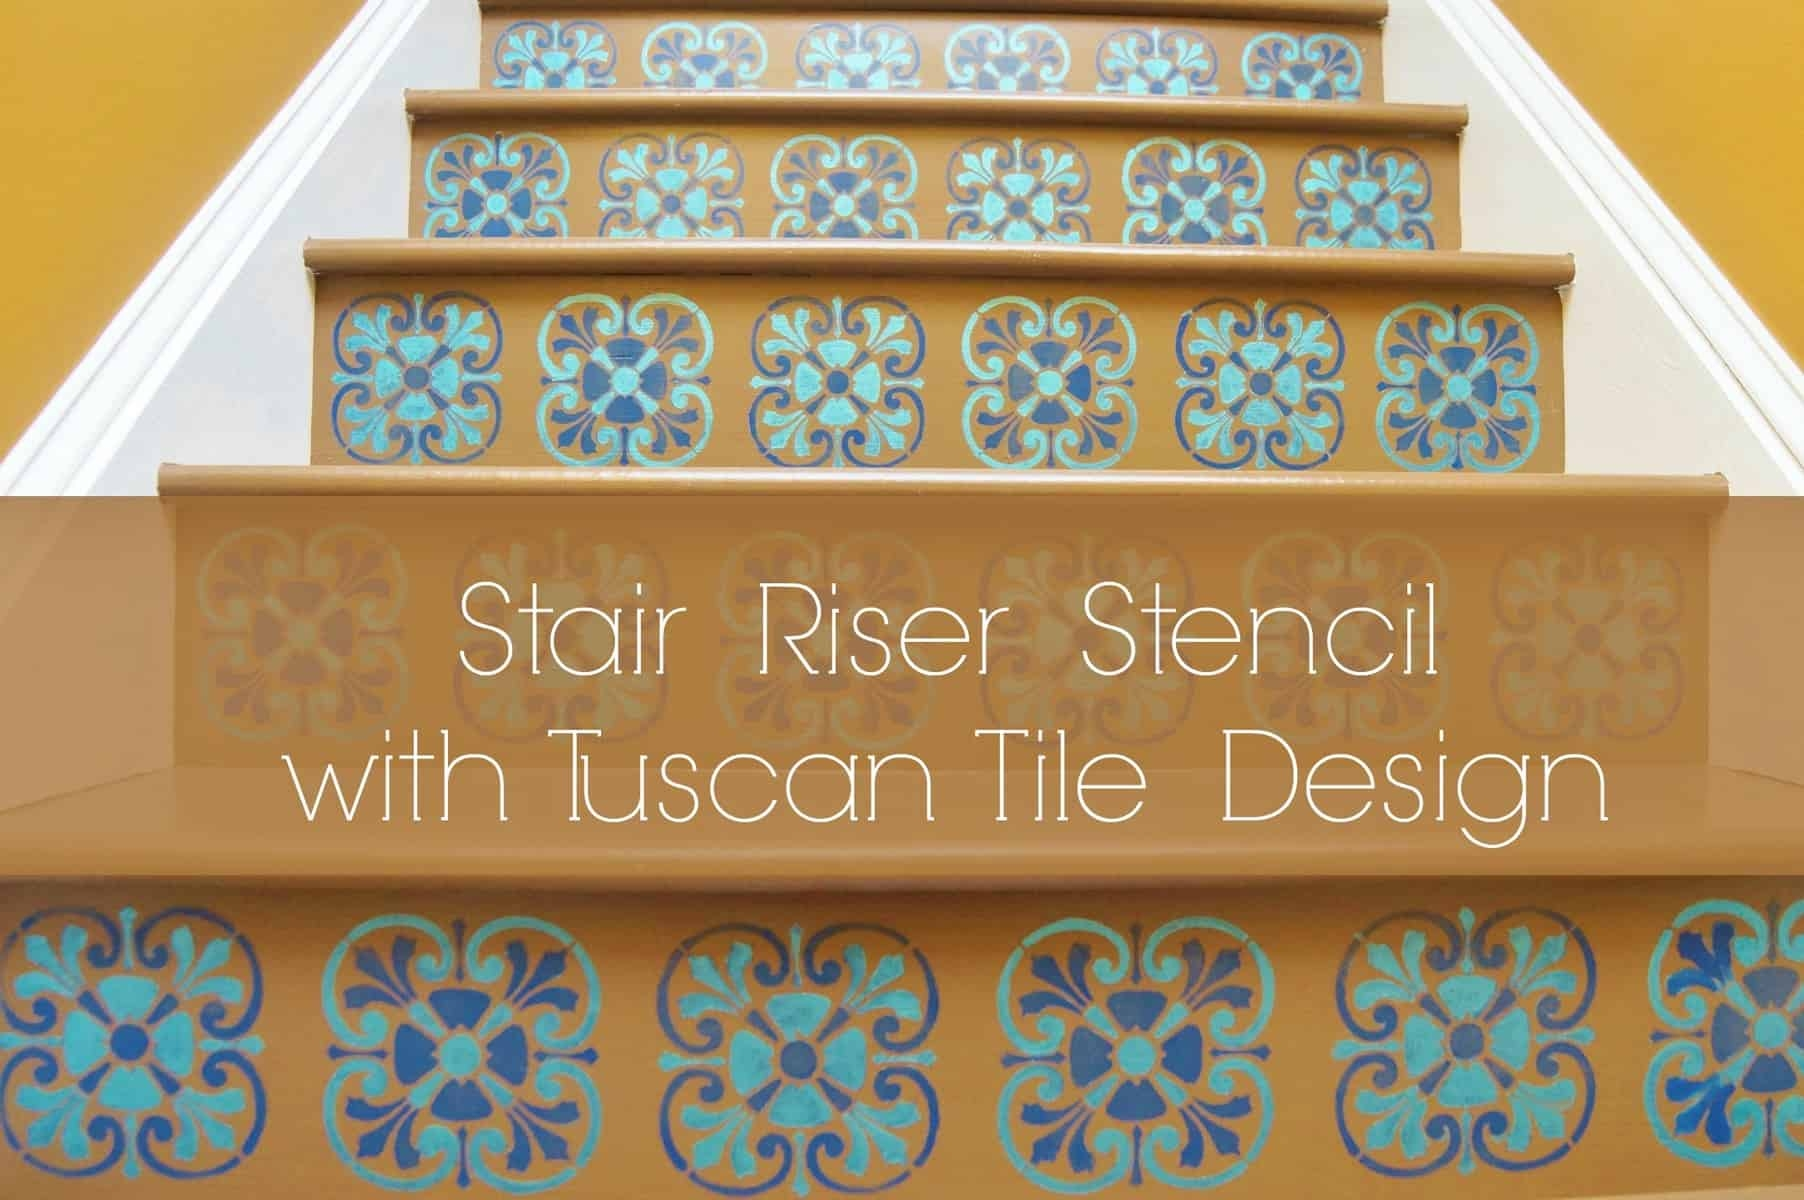 Stair Riser Stencil With Tuscan Tile Design Heartwork   Stair Riser Tiles Designs